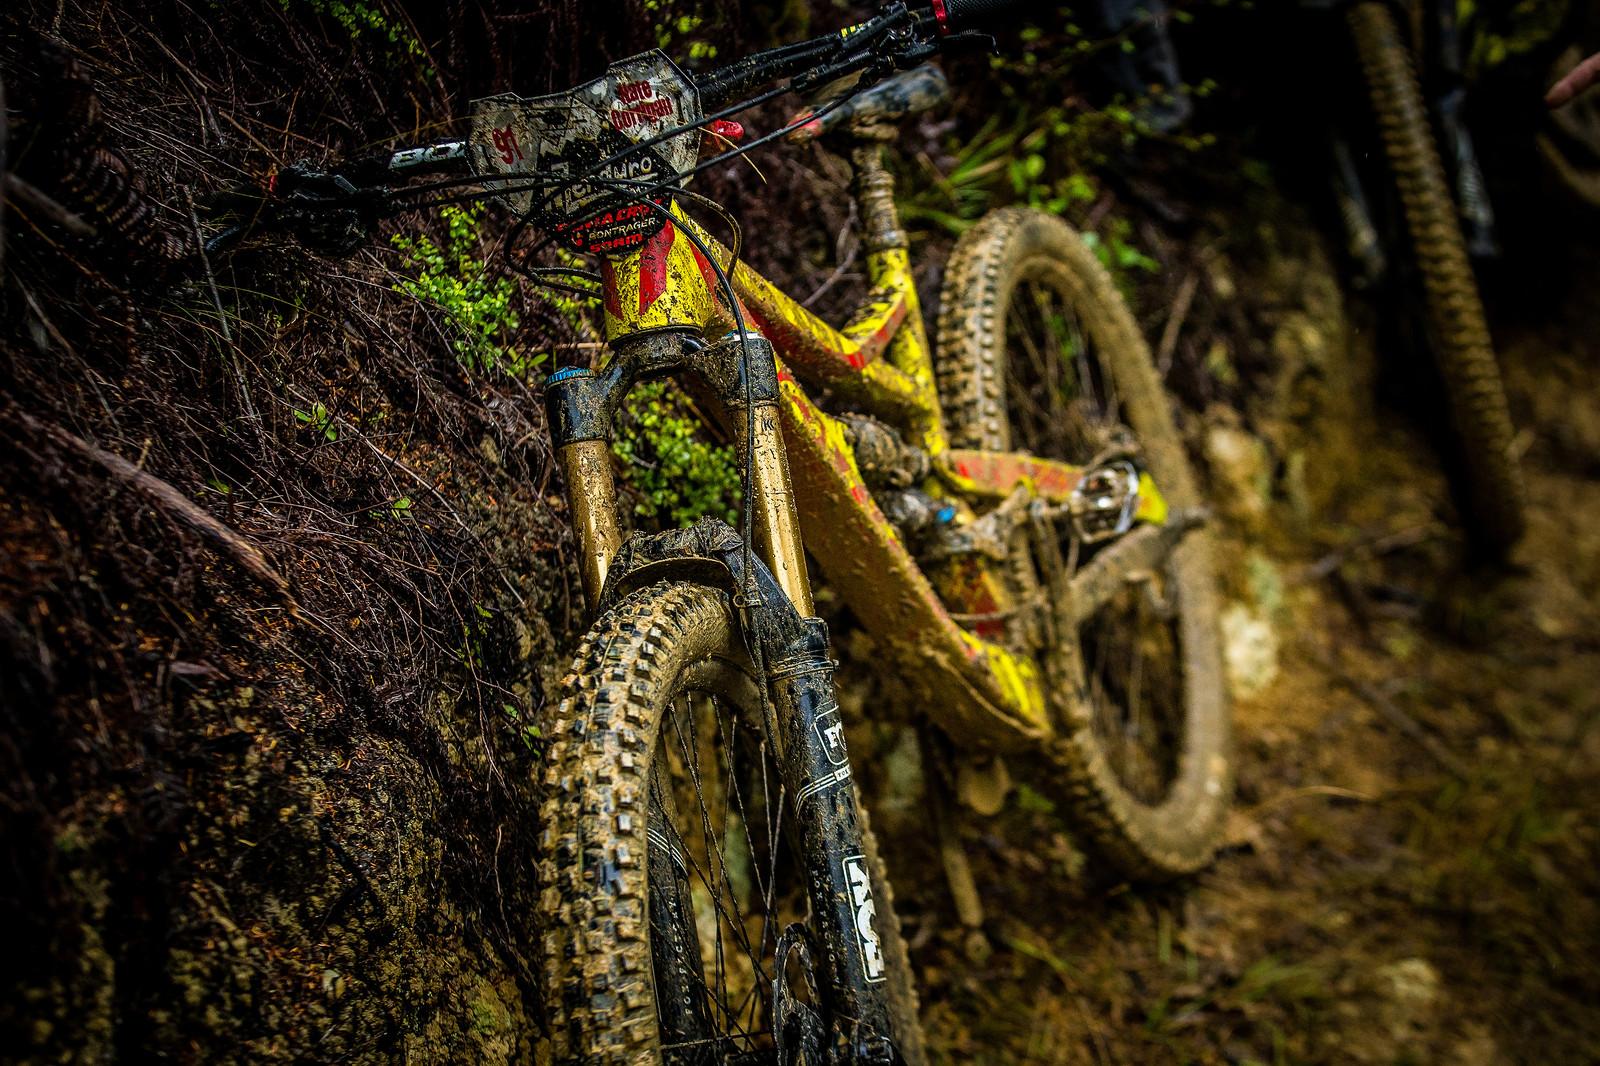 Mud Bikes - NZ Enduro Day 2 - Mountain Biking Pictures - Vital MTB